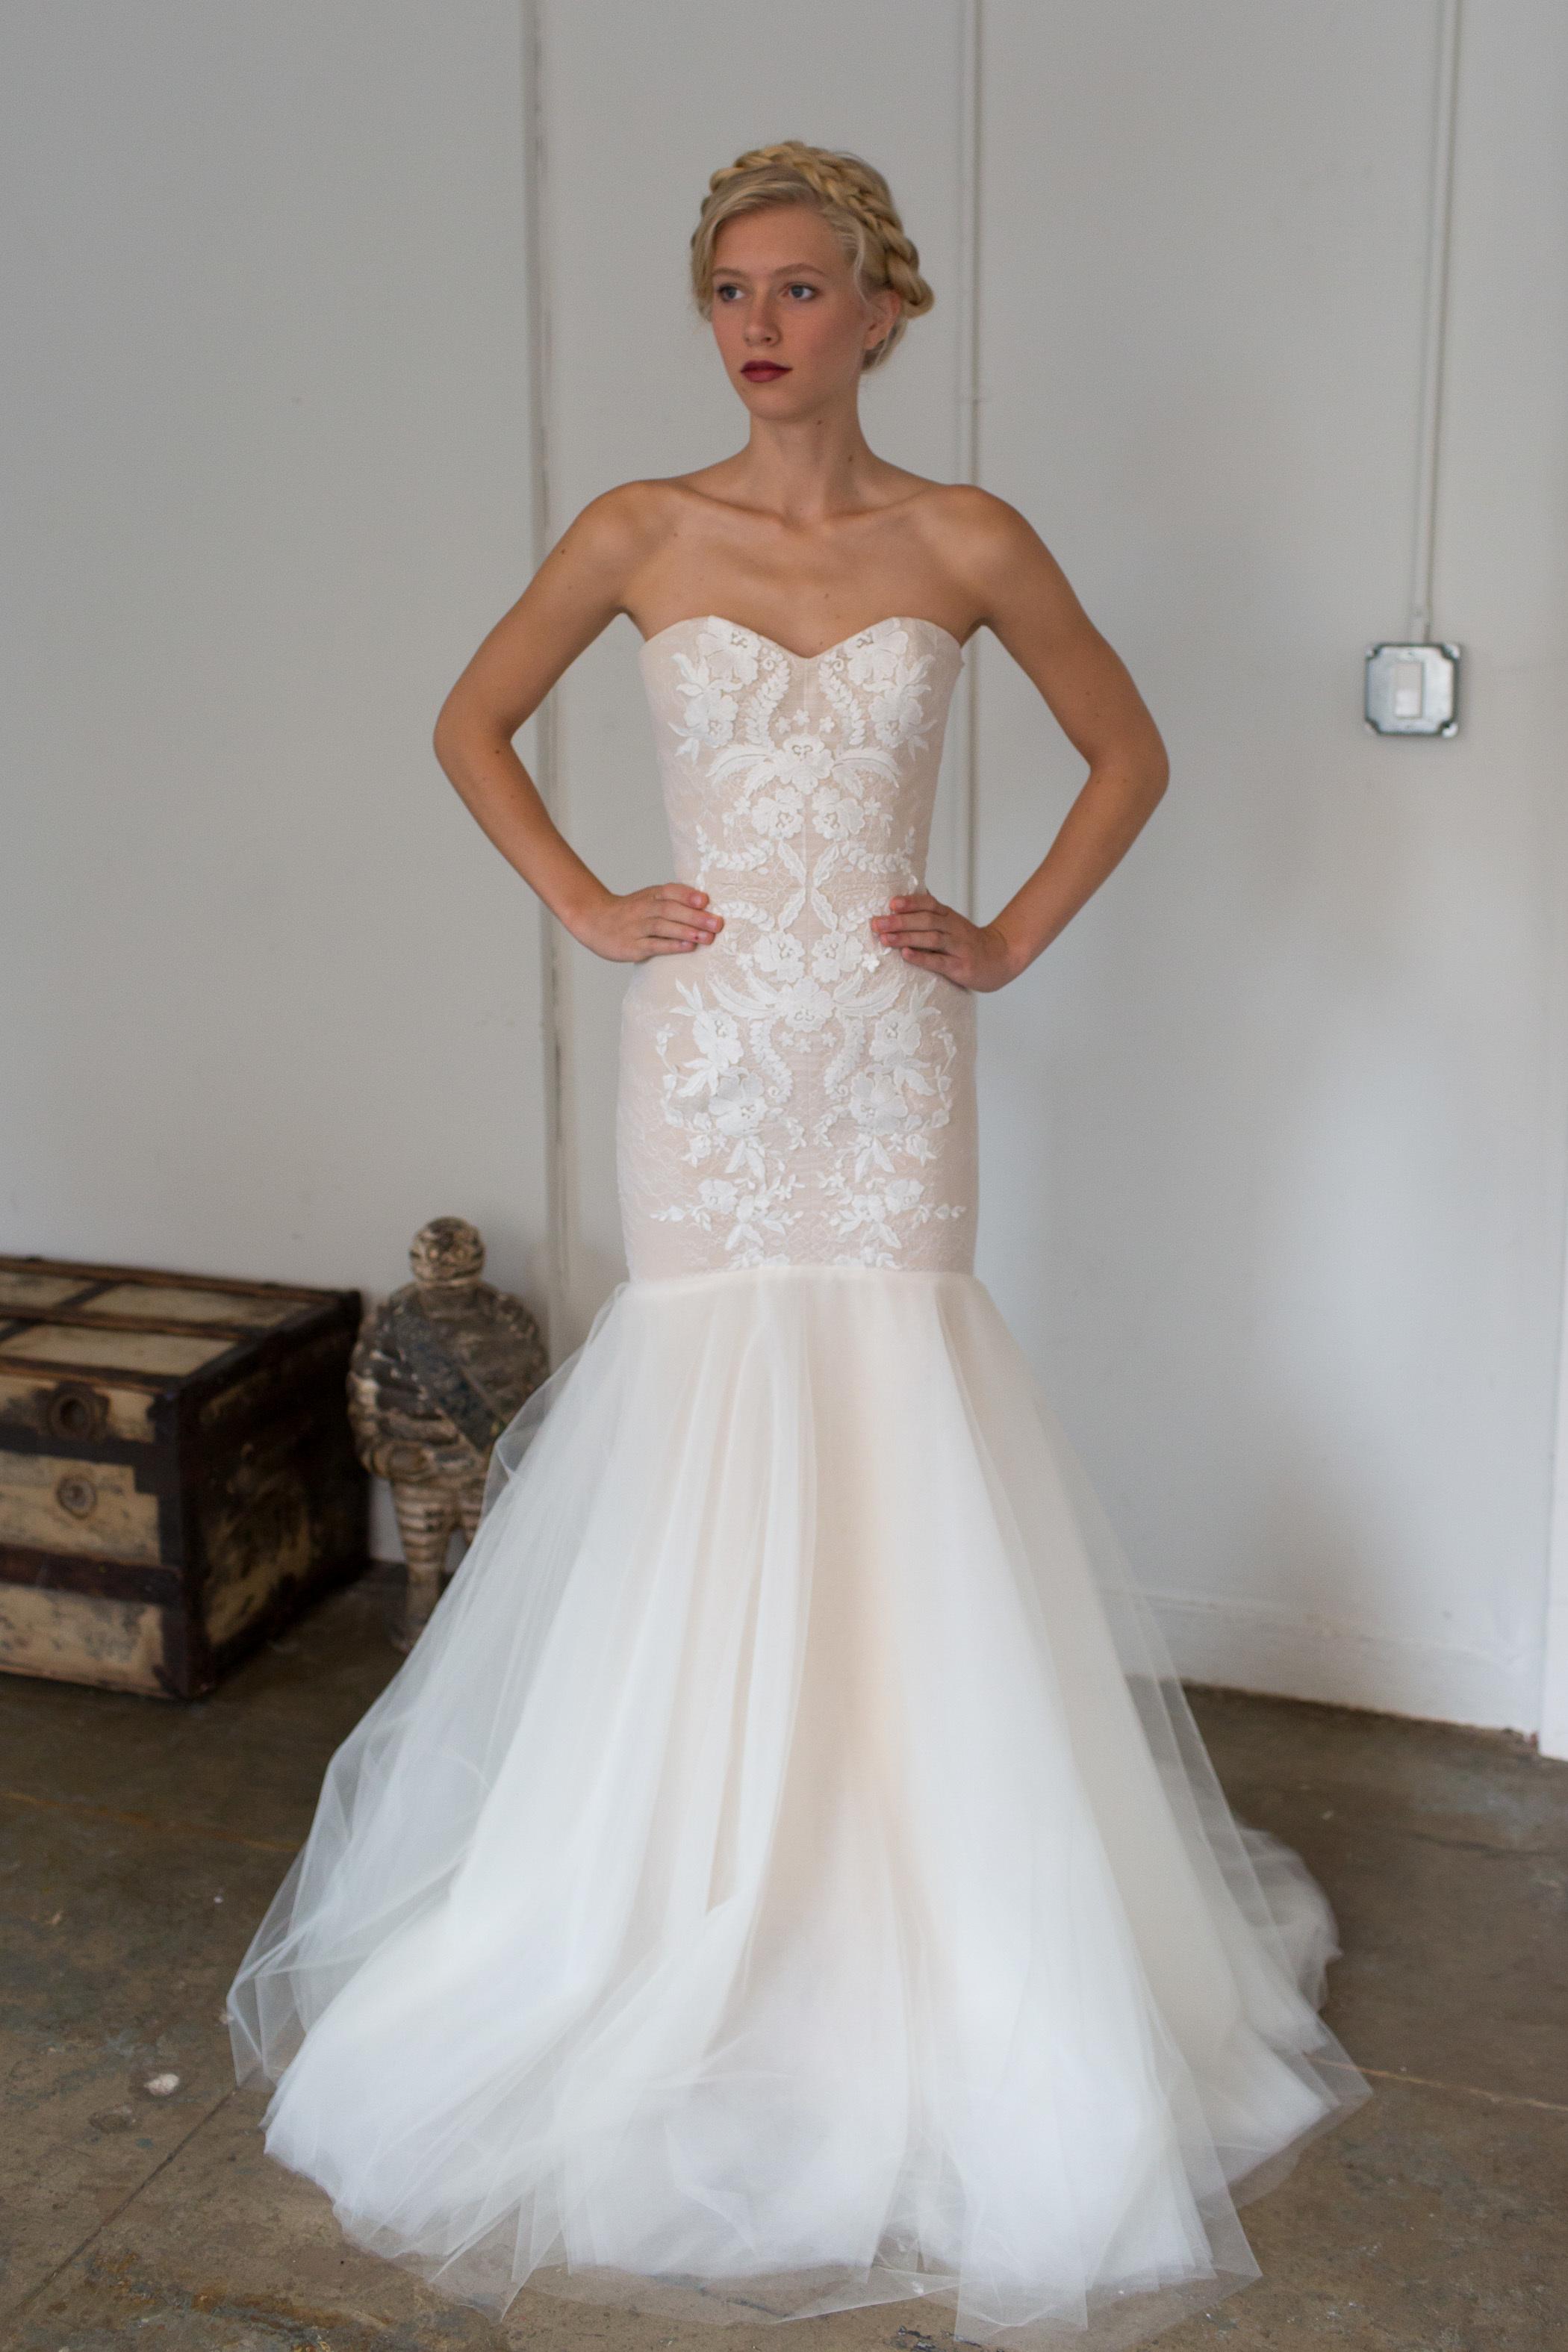 Paloma wedding dress by Tara LaTour